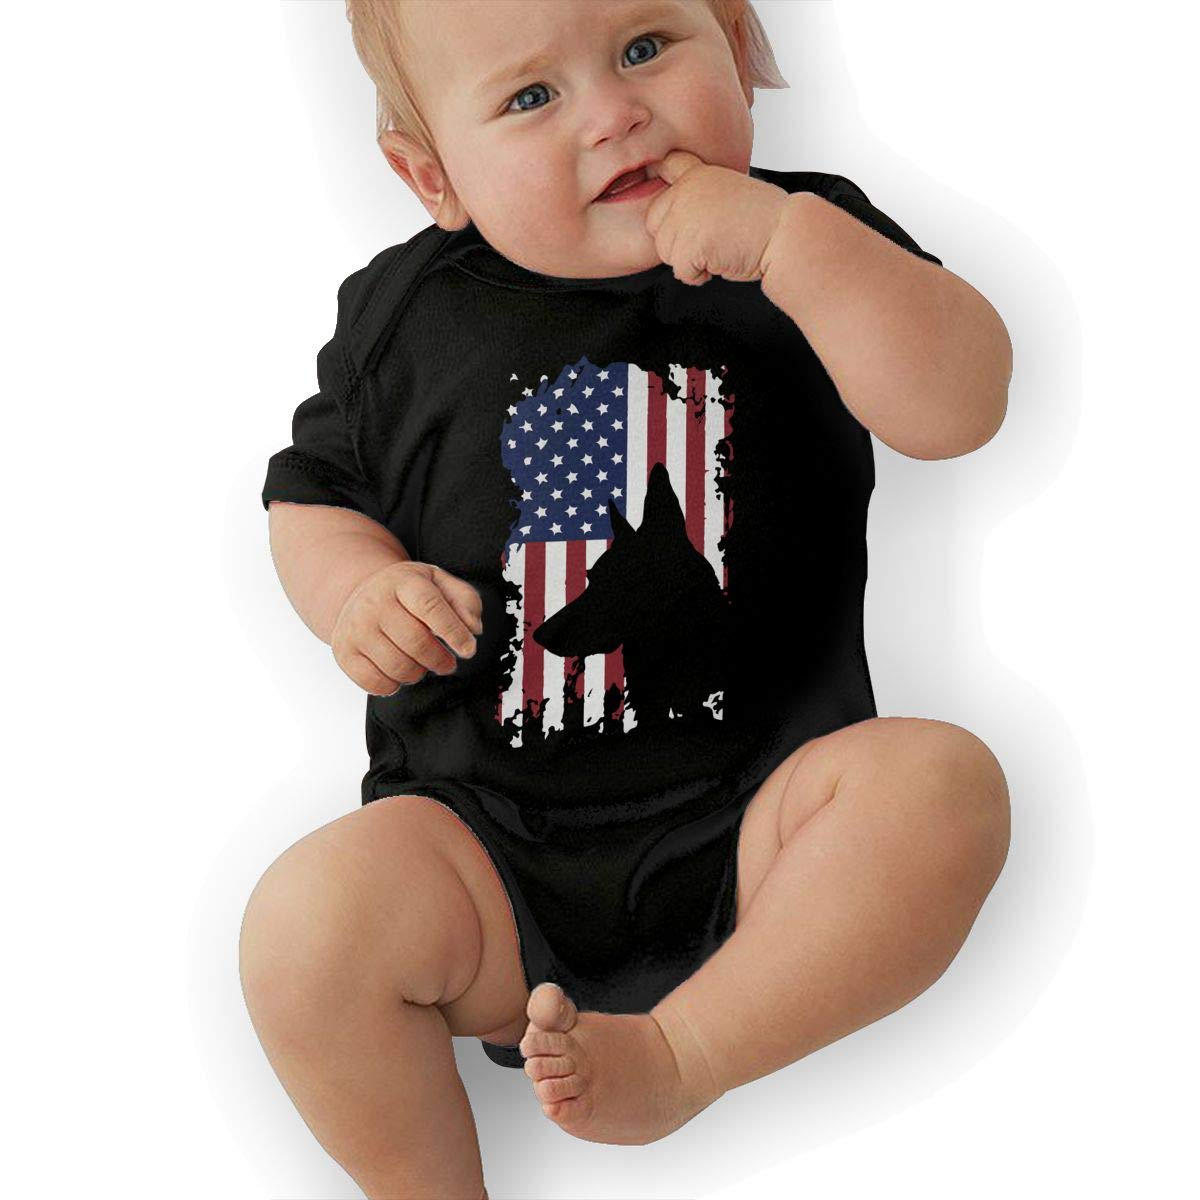 Mri-le2 Newborn Kids Short Sleeve Bodysuits German Shepherd American Flag Baby Clothes